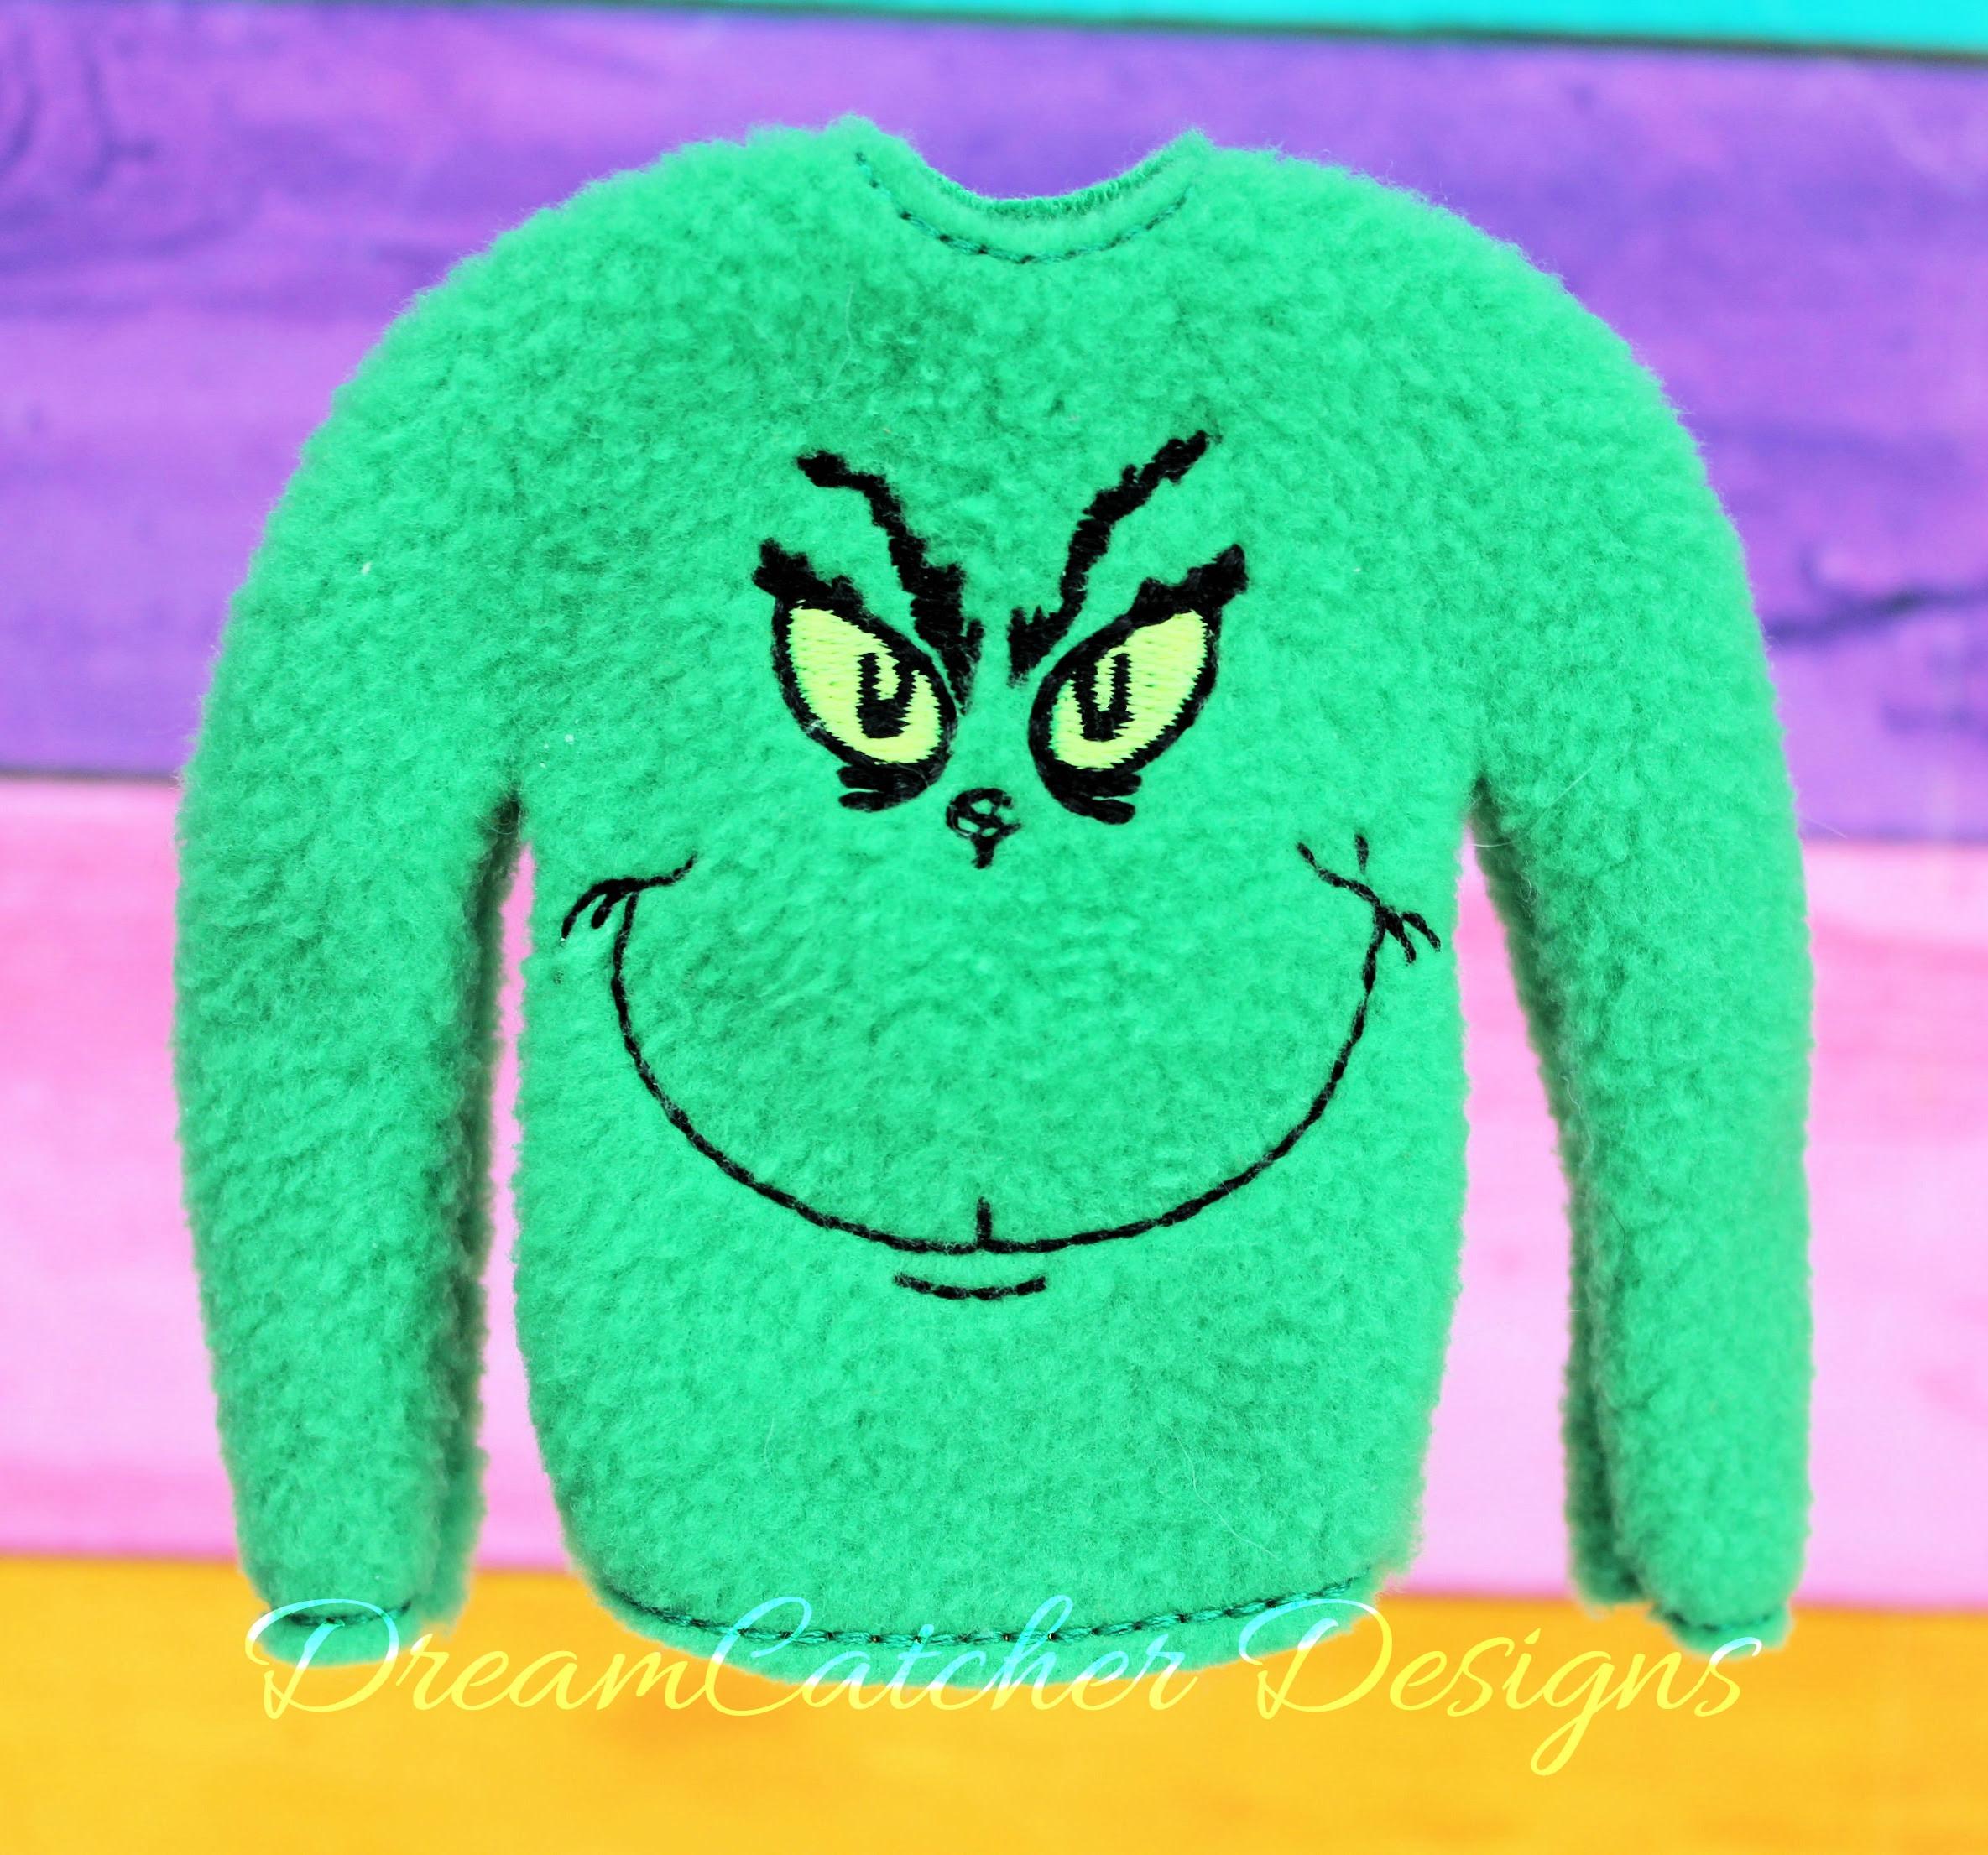 In The Hoop Green Monster Holiday Sweater Elfdoll Christmas